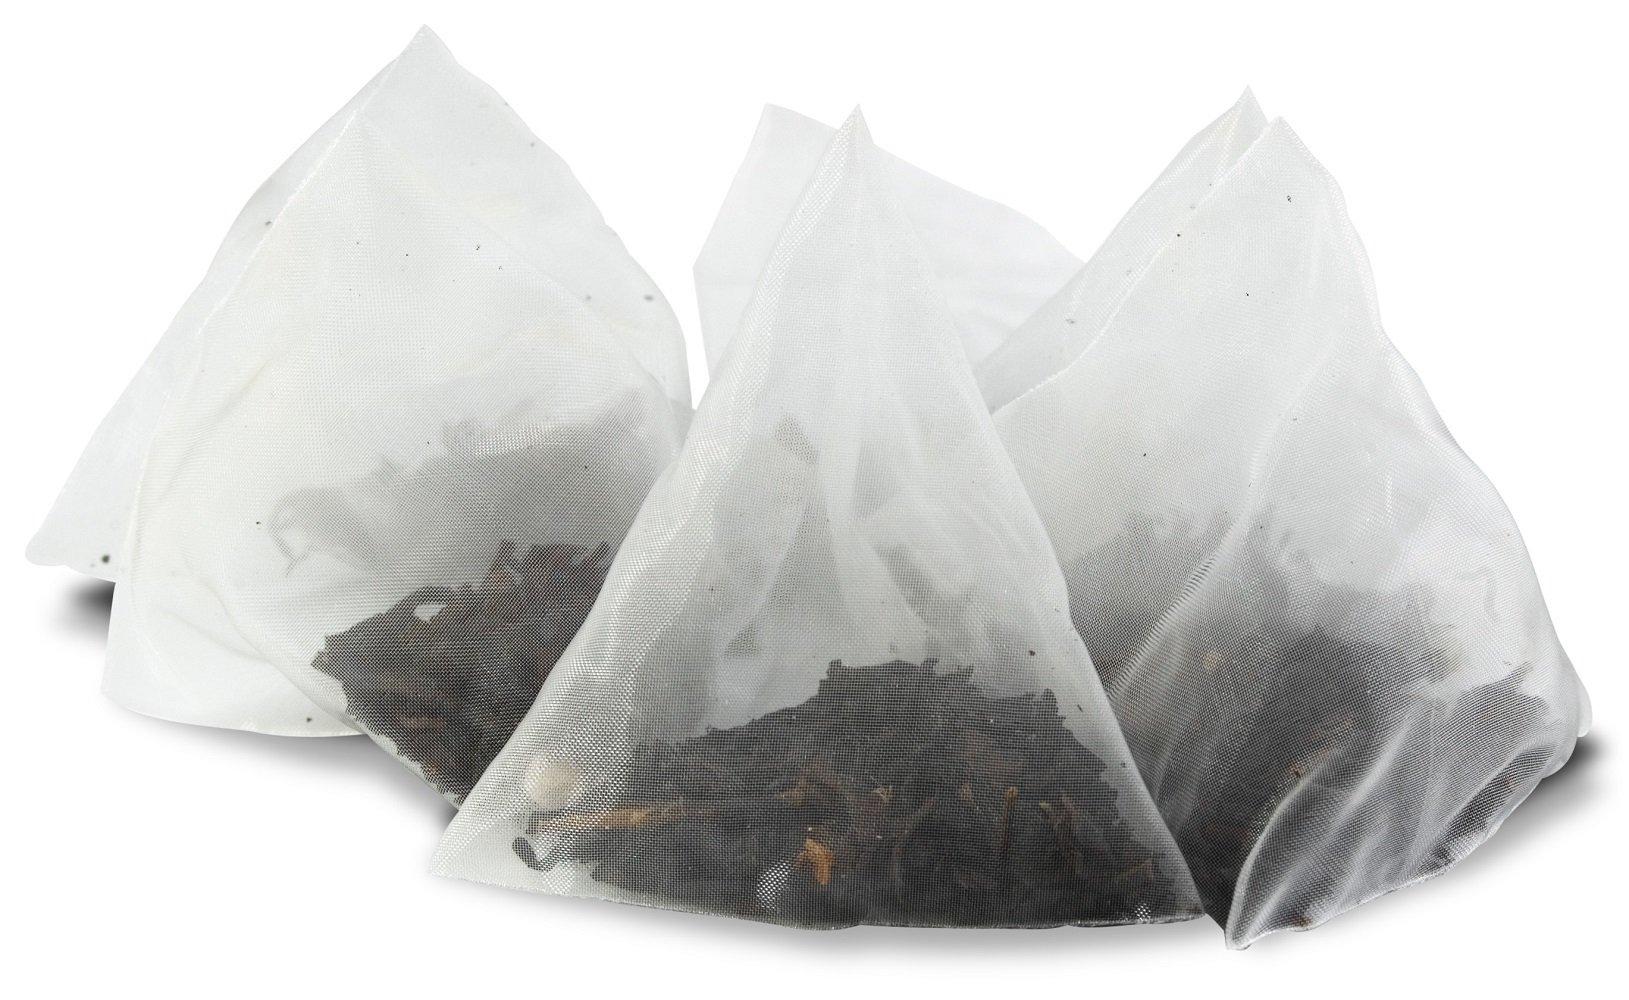 White Lion Ginger Peach Bulk Sachet Resealable Tea Bag, 200 Count by White Lion